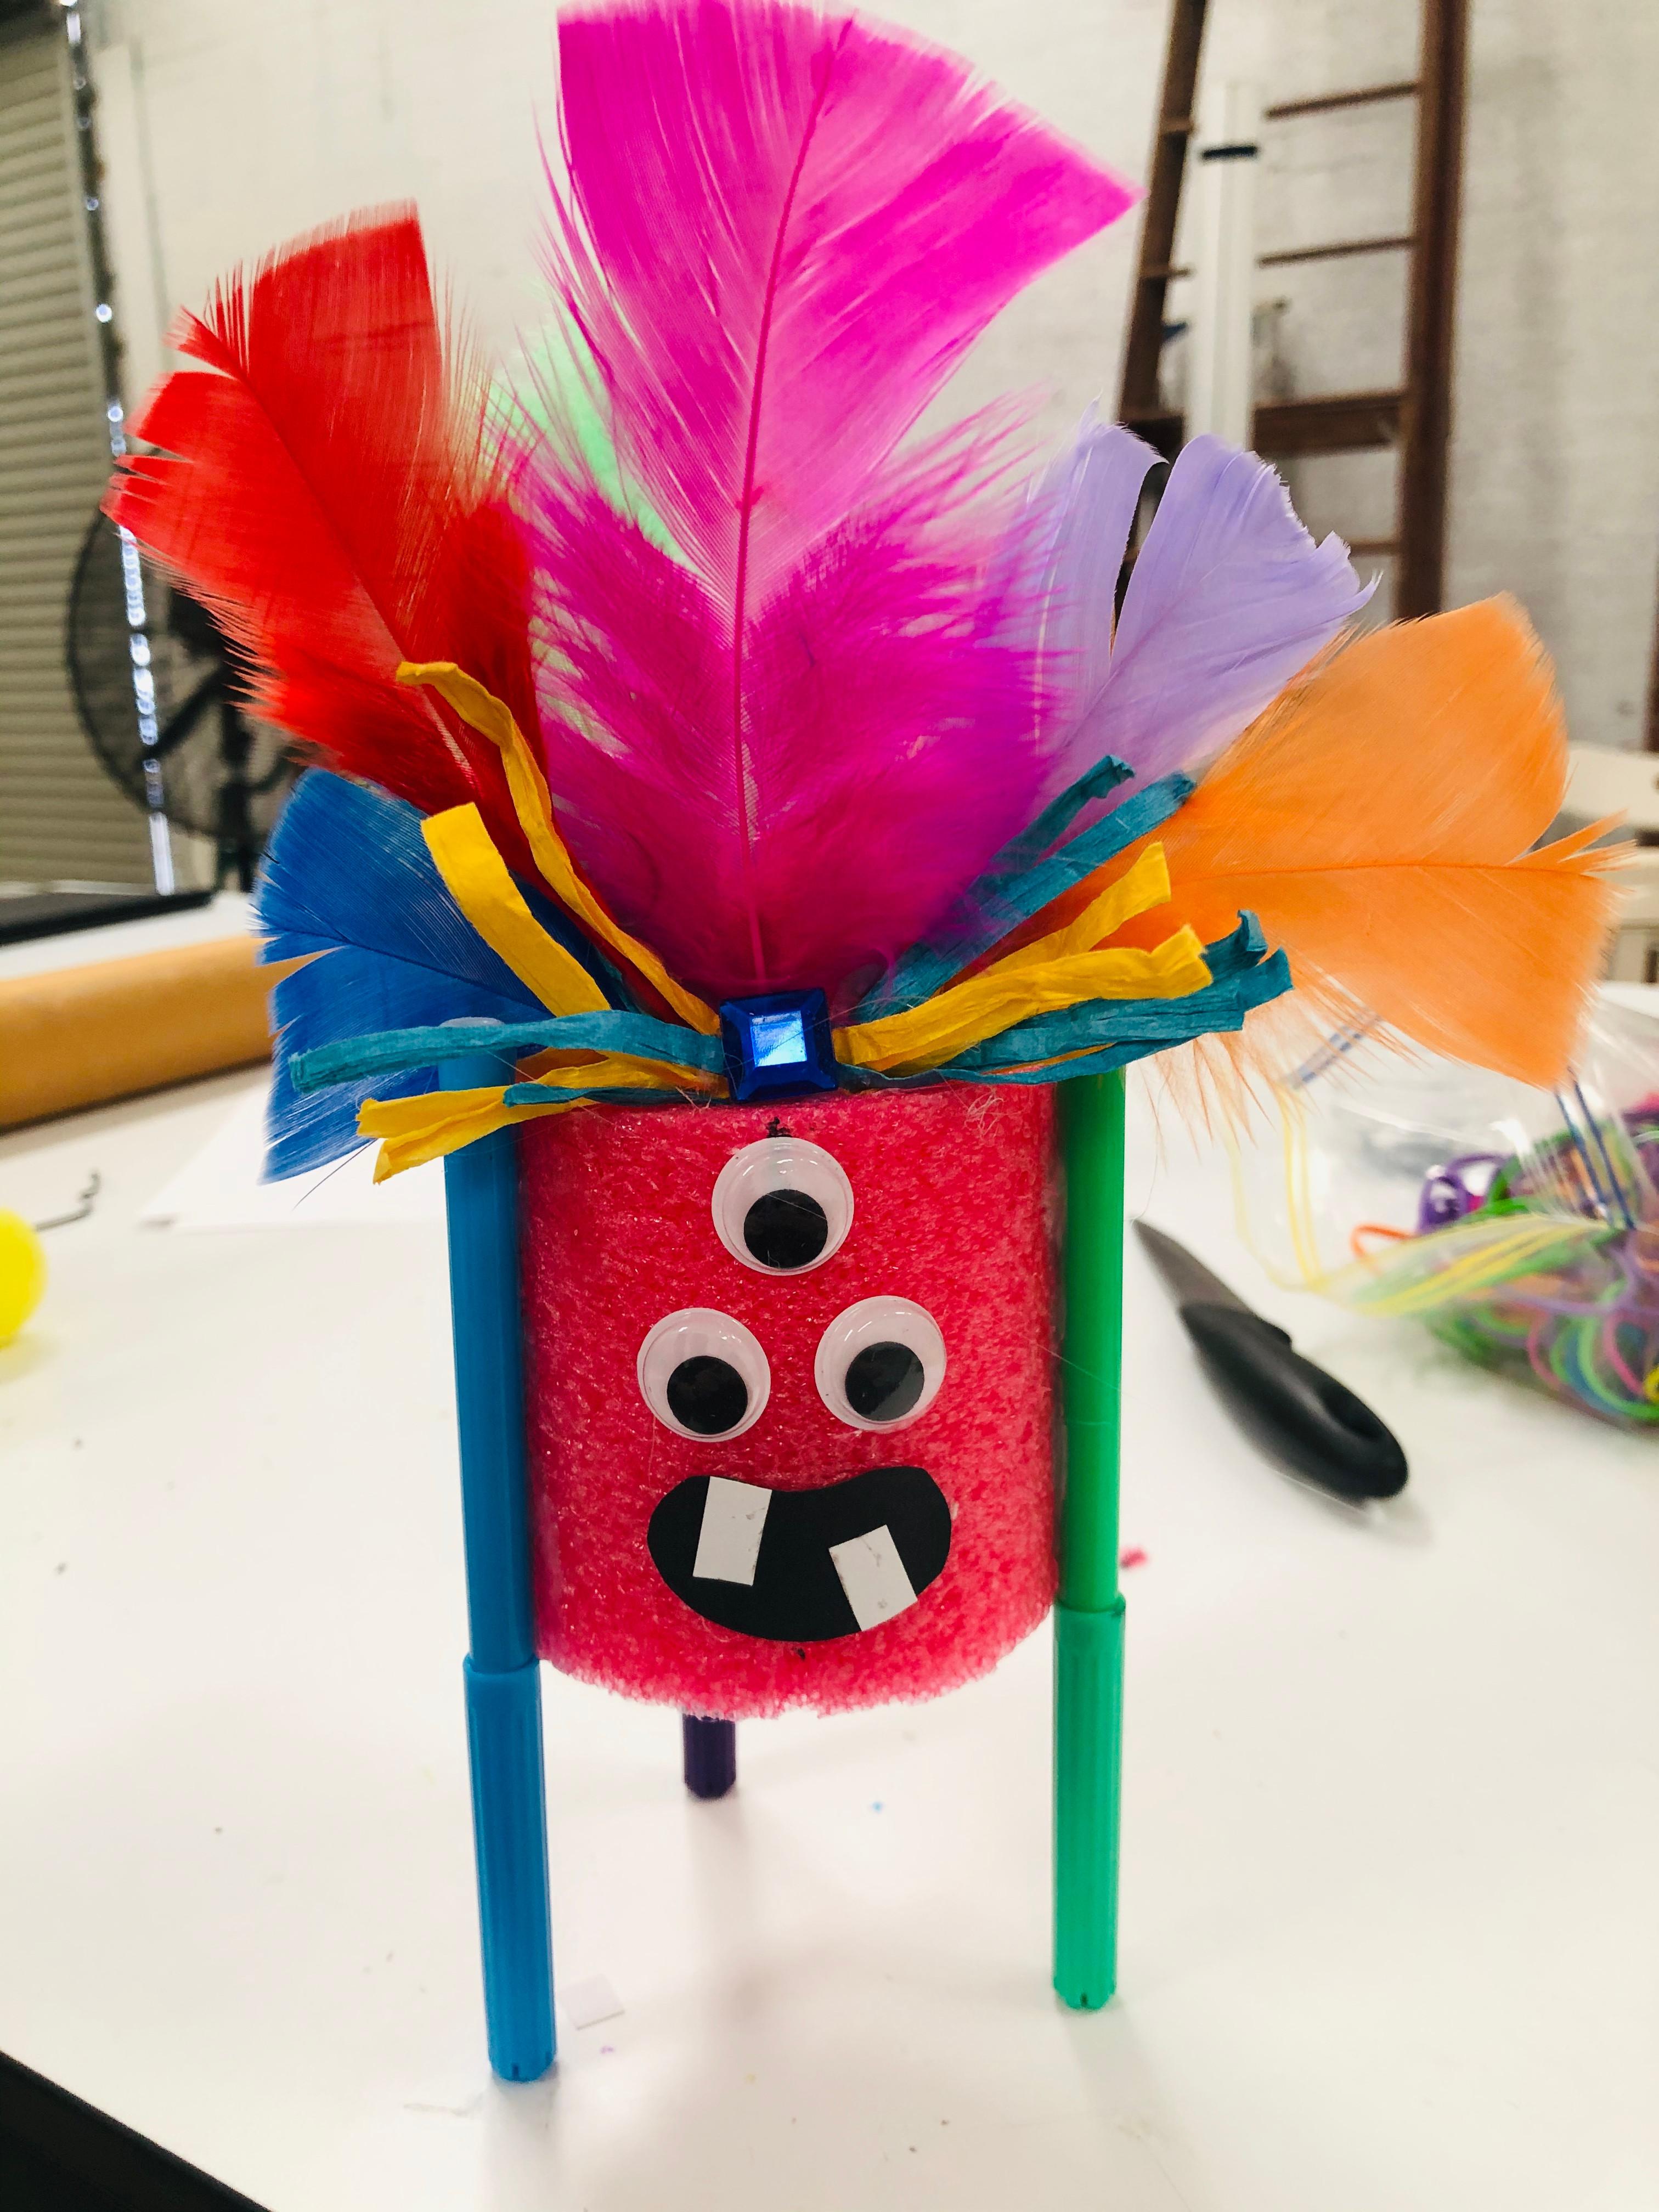 Build an ArtBot